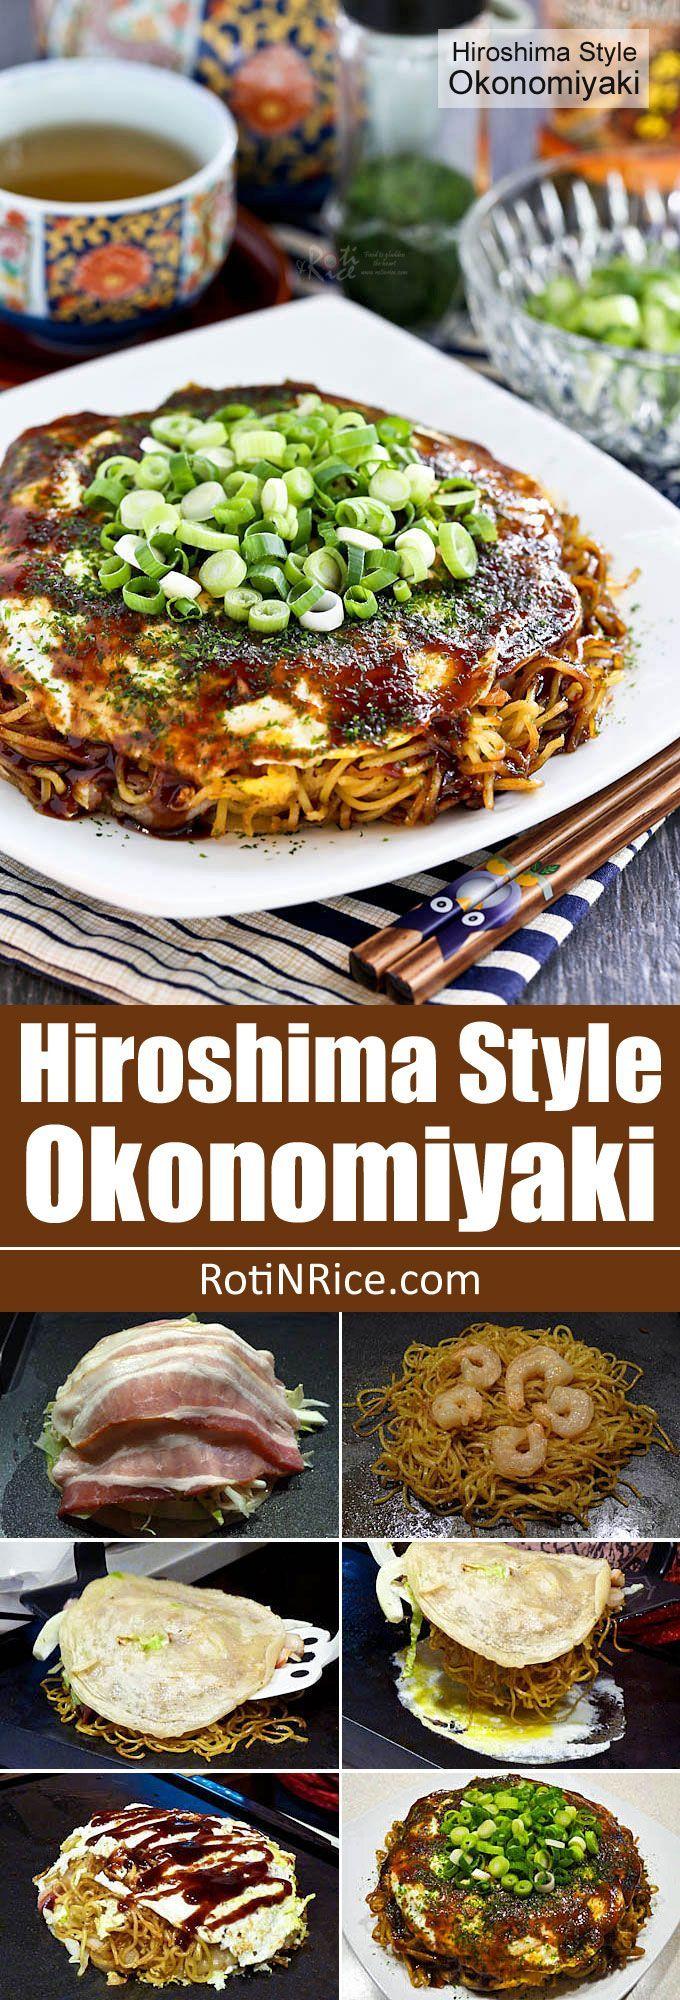 Hiroshima Style Okonomiyaki (Japanese Layered Pancakes) - the ultimate savory pancake complete with cabbage, bacon, noodles, shrimp, and egg. So yummy!   RotiNRice.com